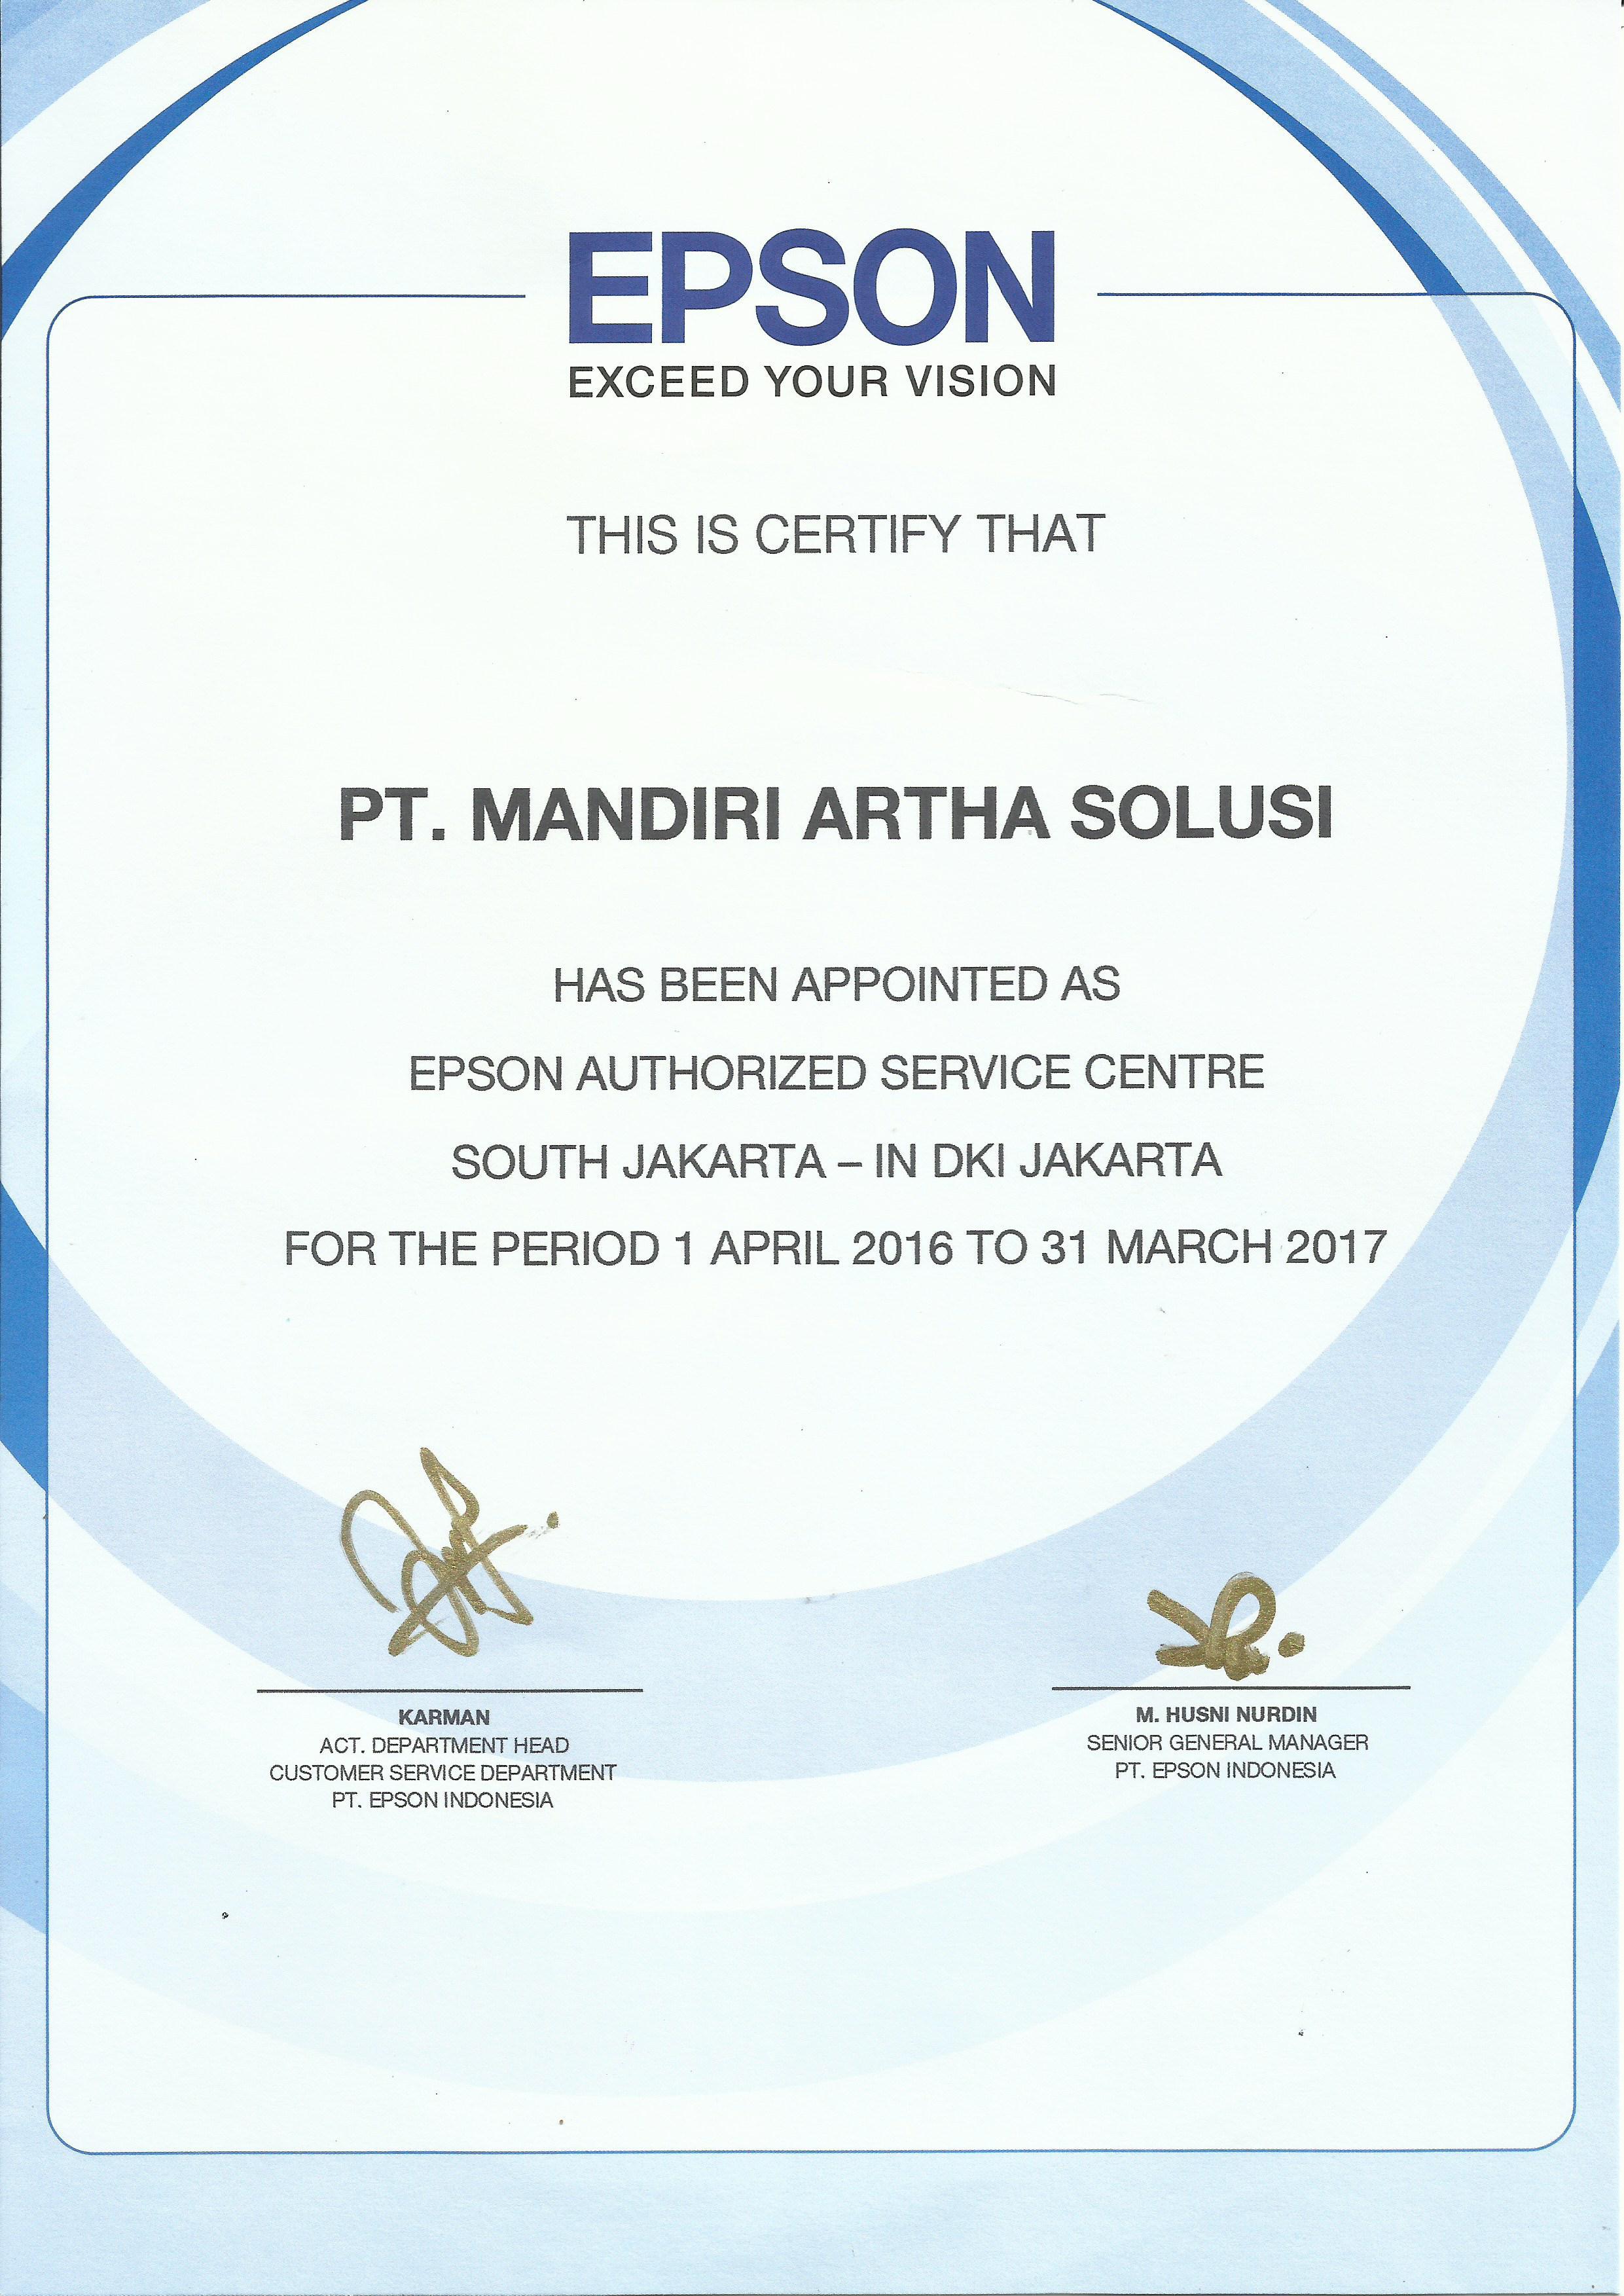 epson authorized service centre certificate